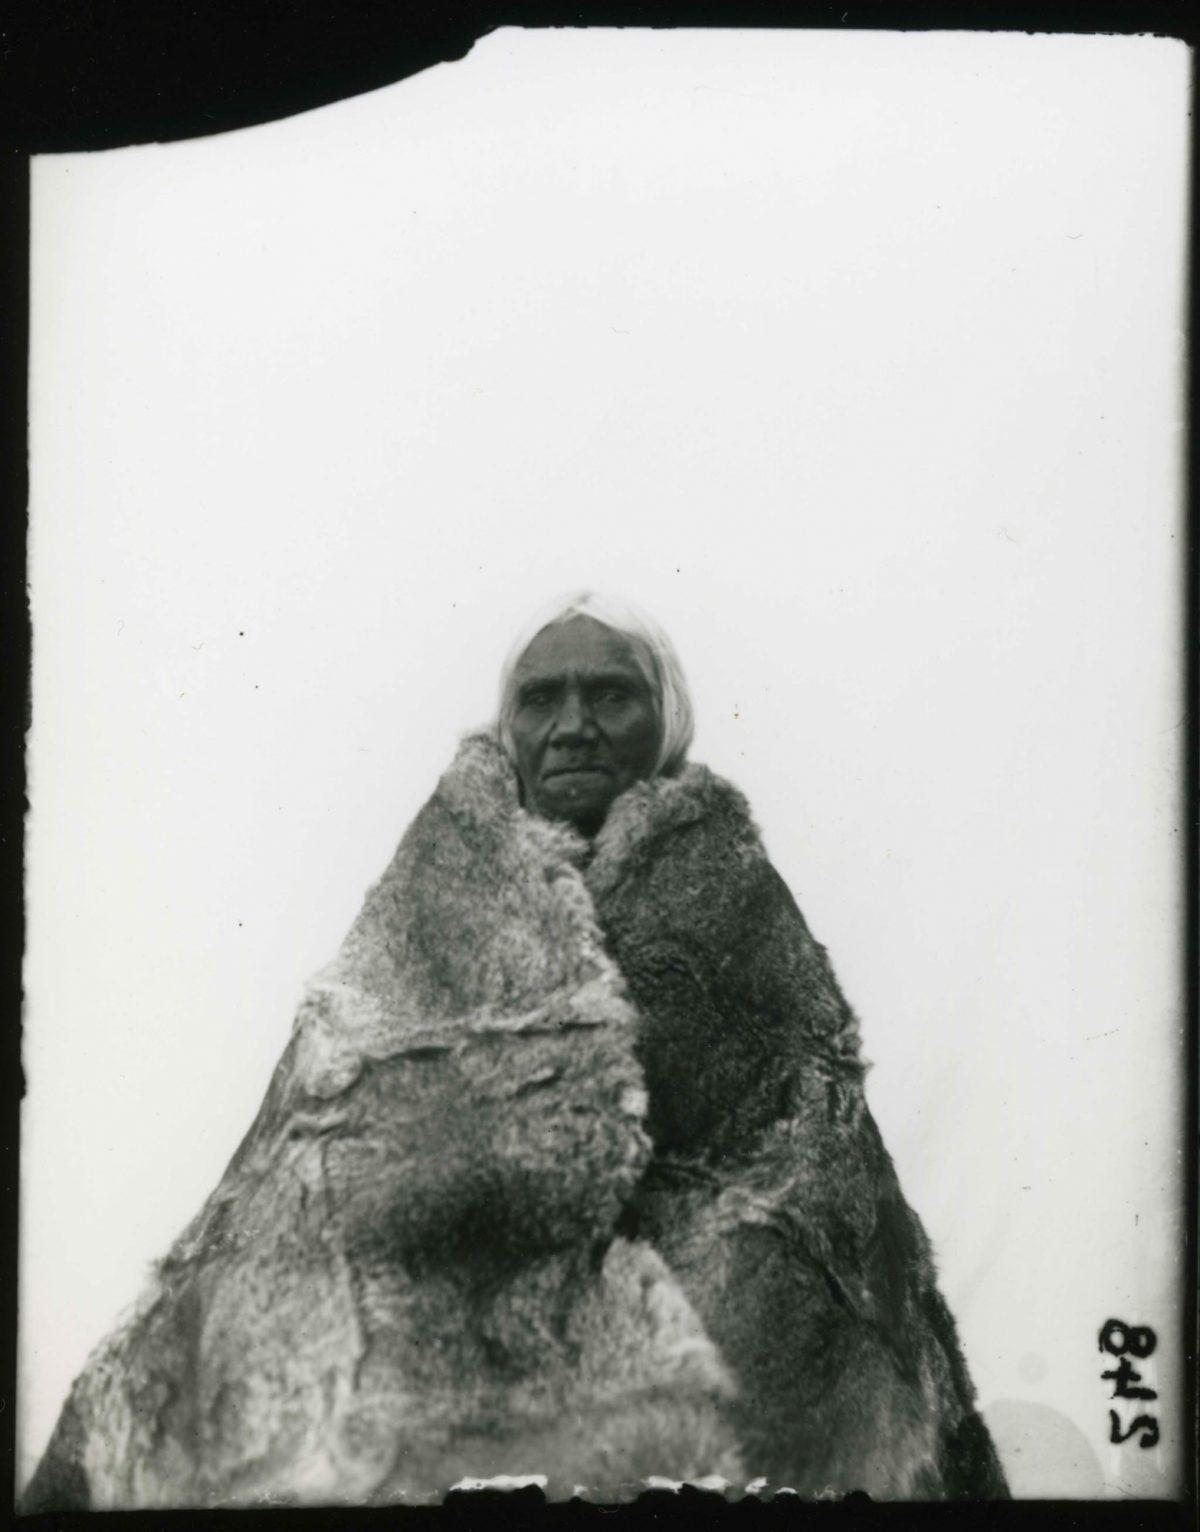 Iparrityi photo for al online ivaritji acknowledgement aa124 5 4 south australian museum